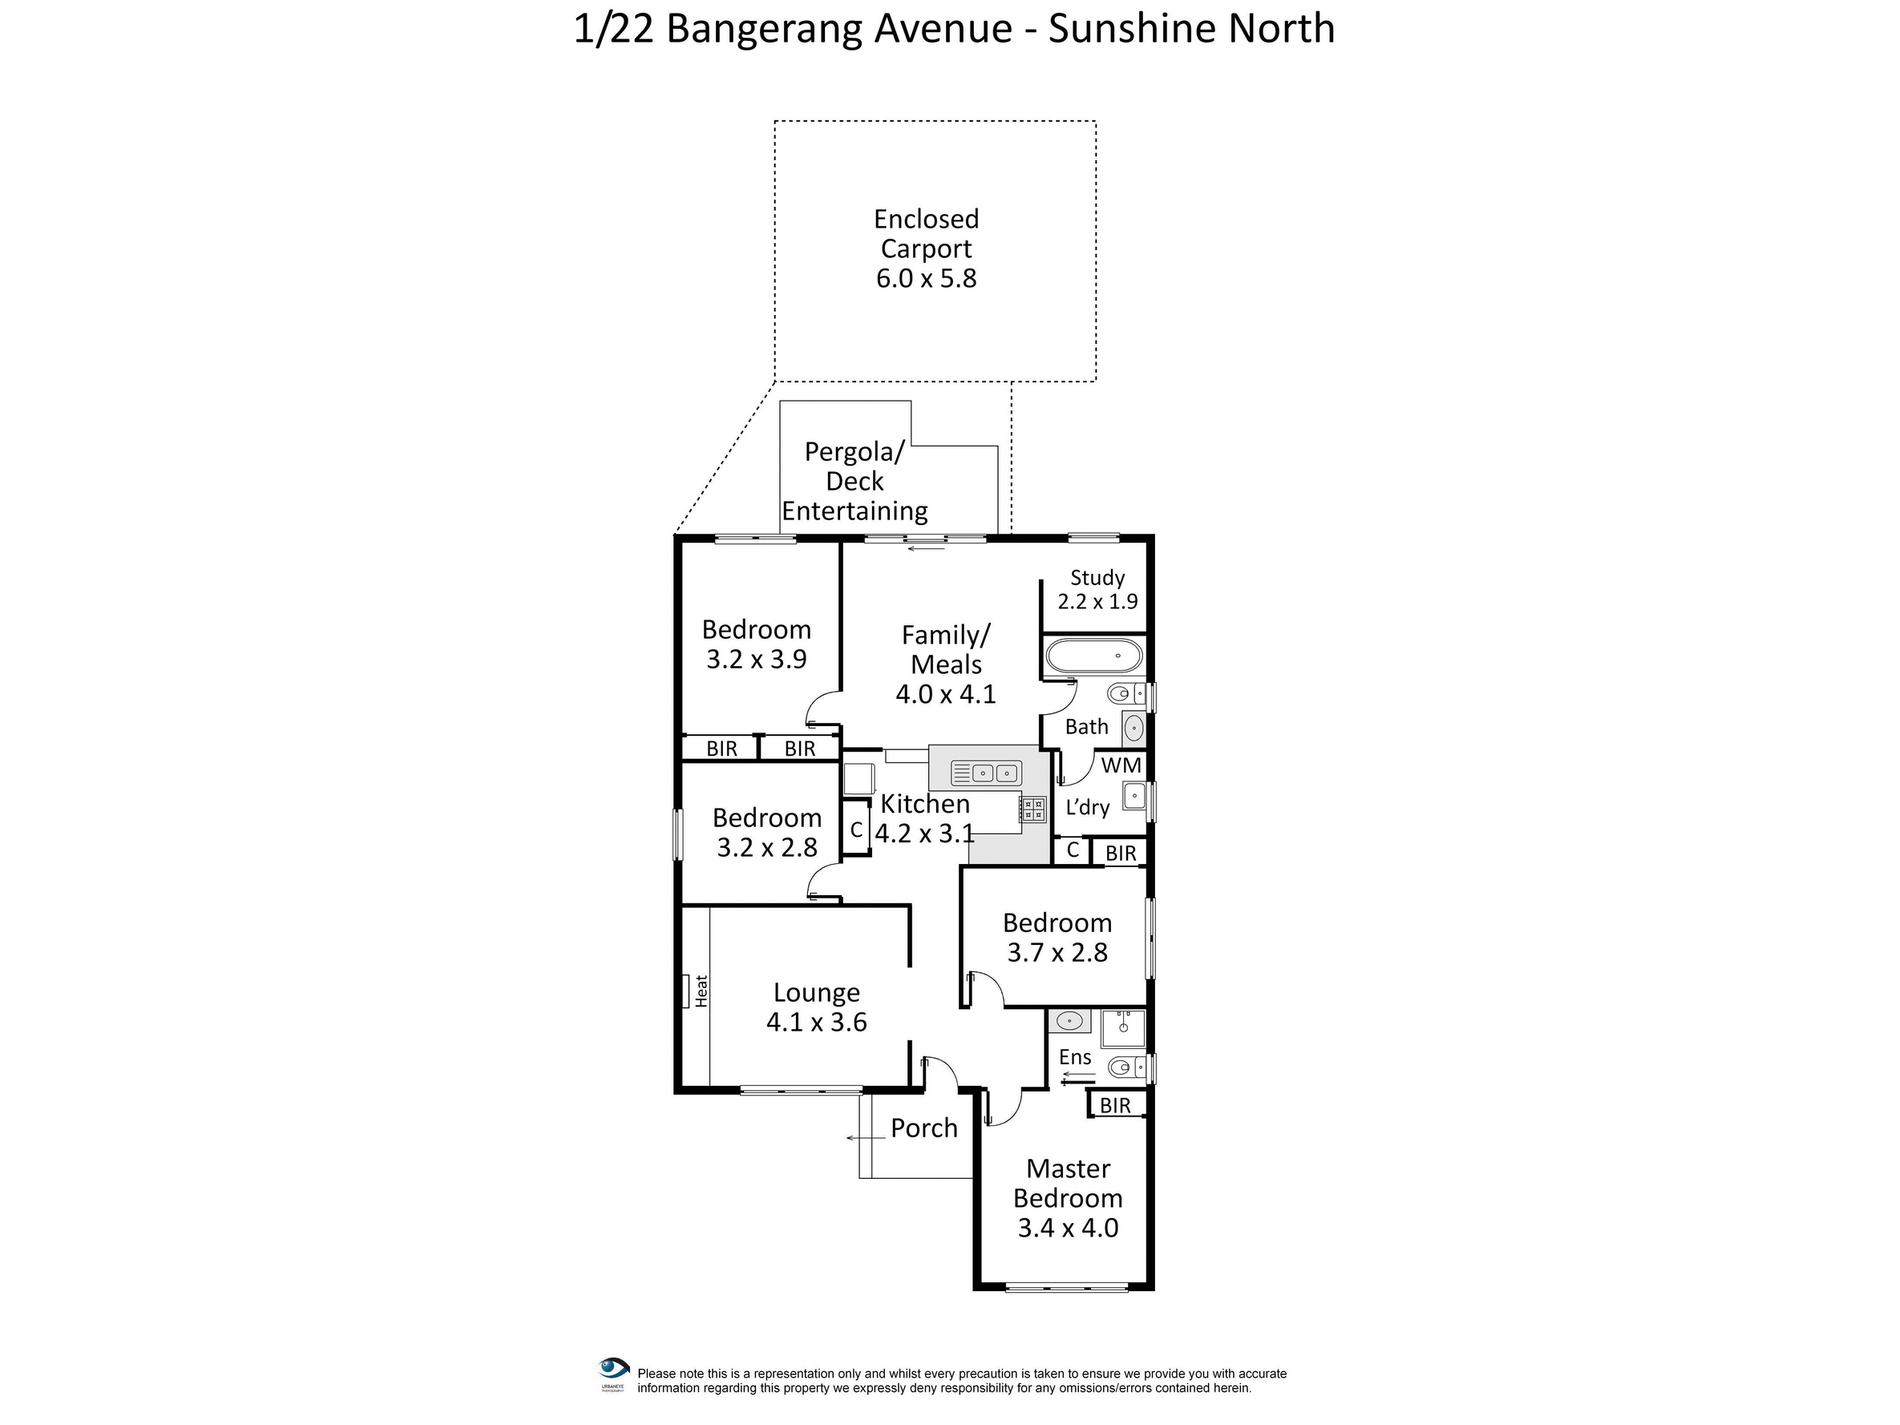 1 / 22 Bangerang Avenue, Sunshine North